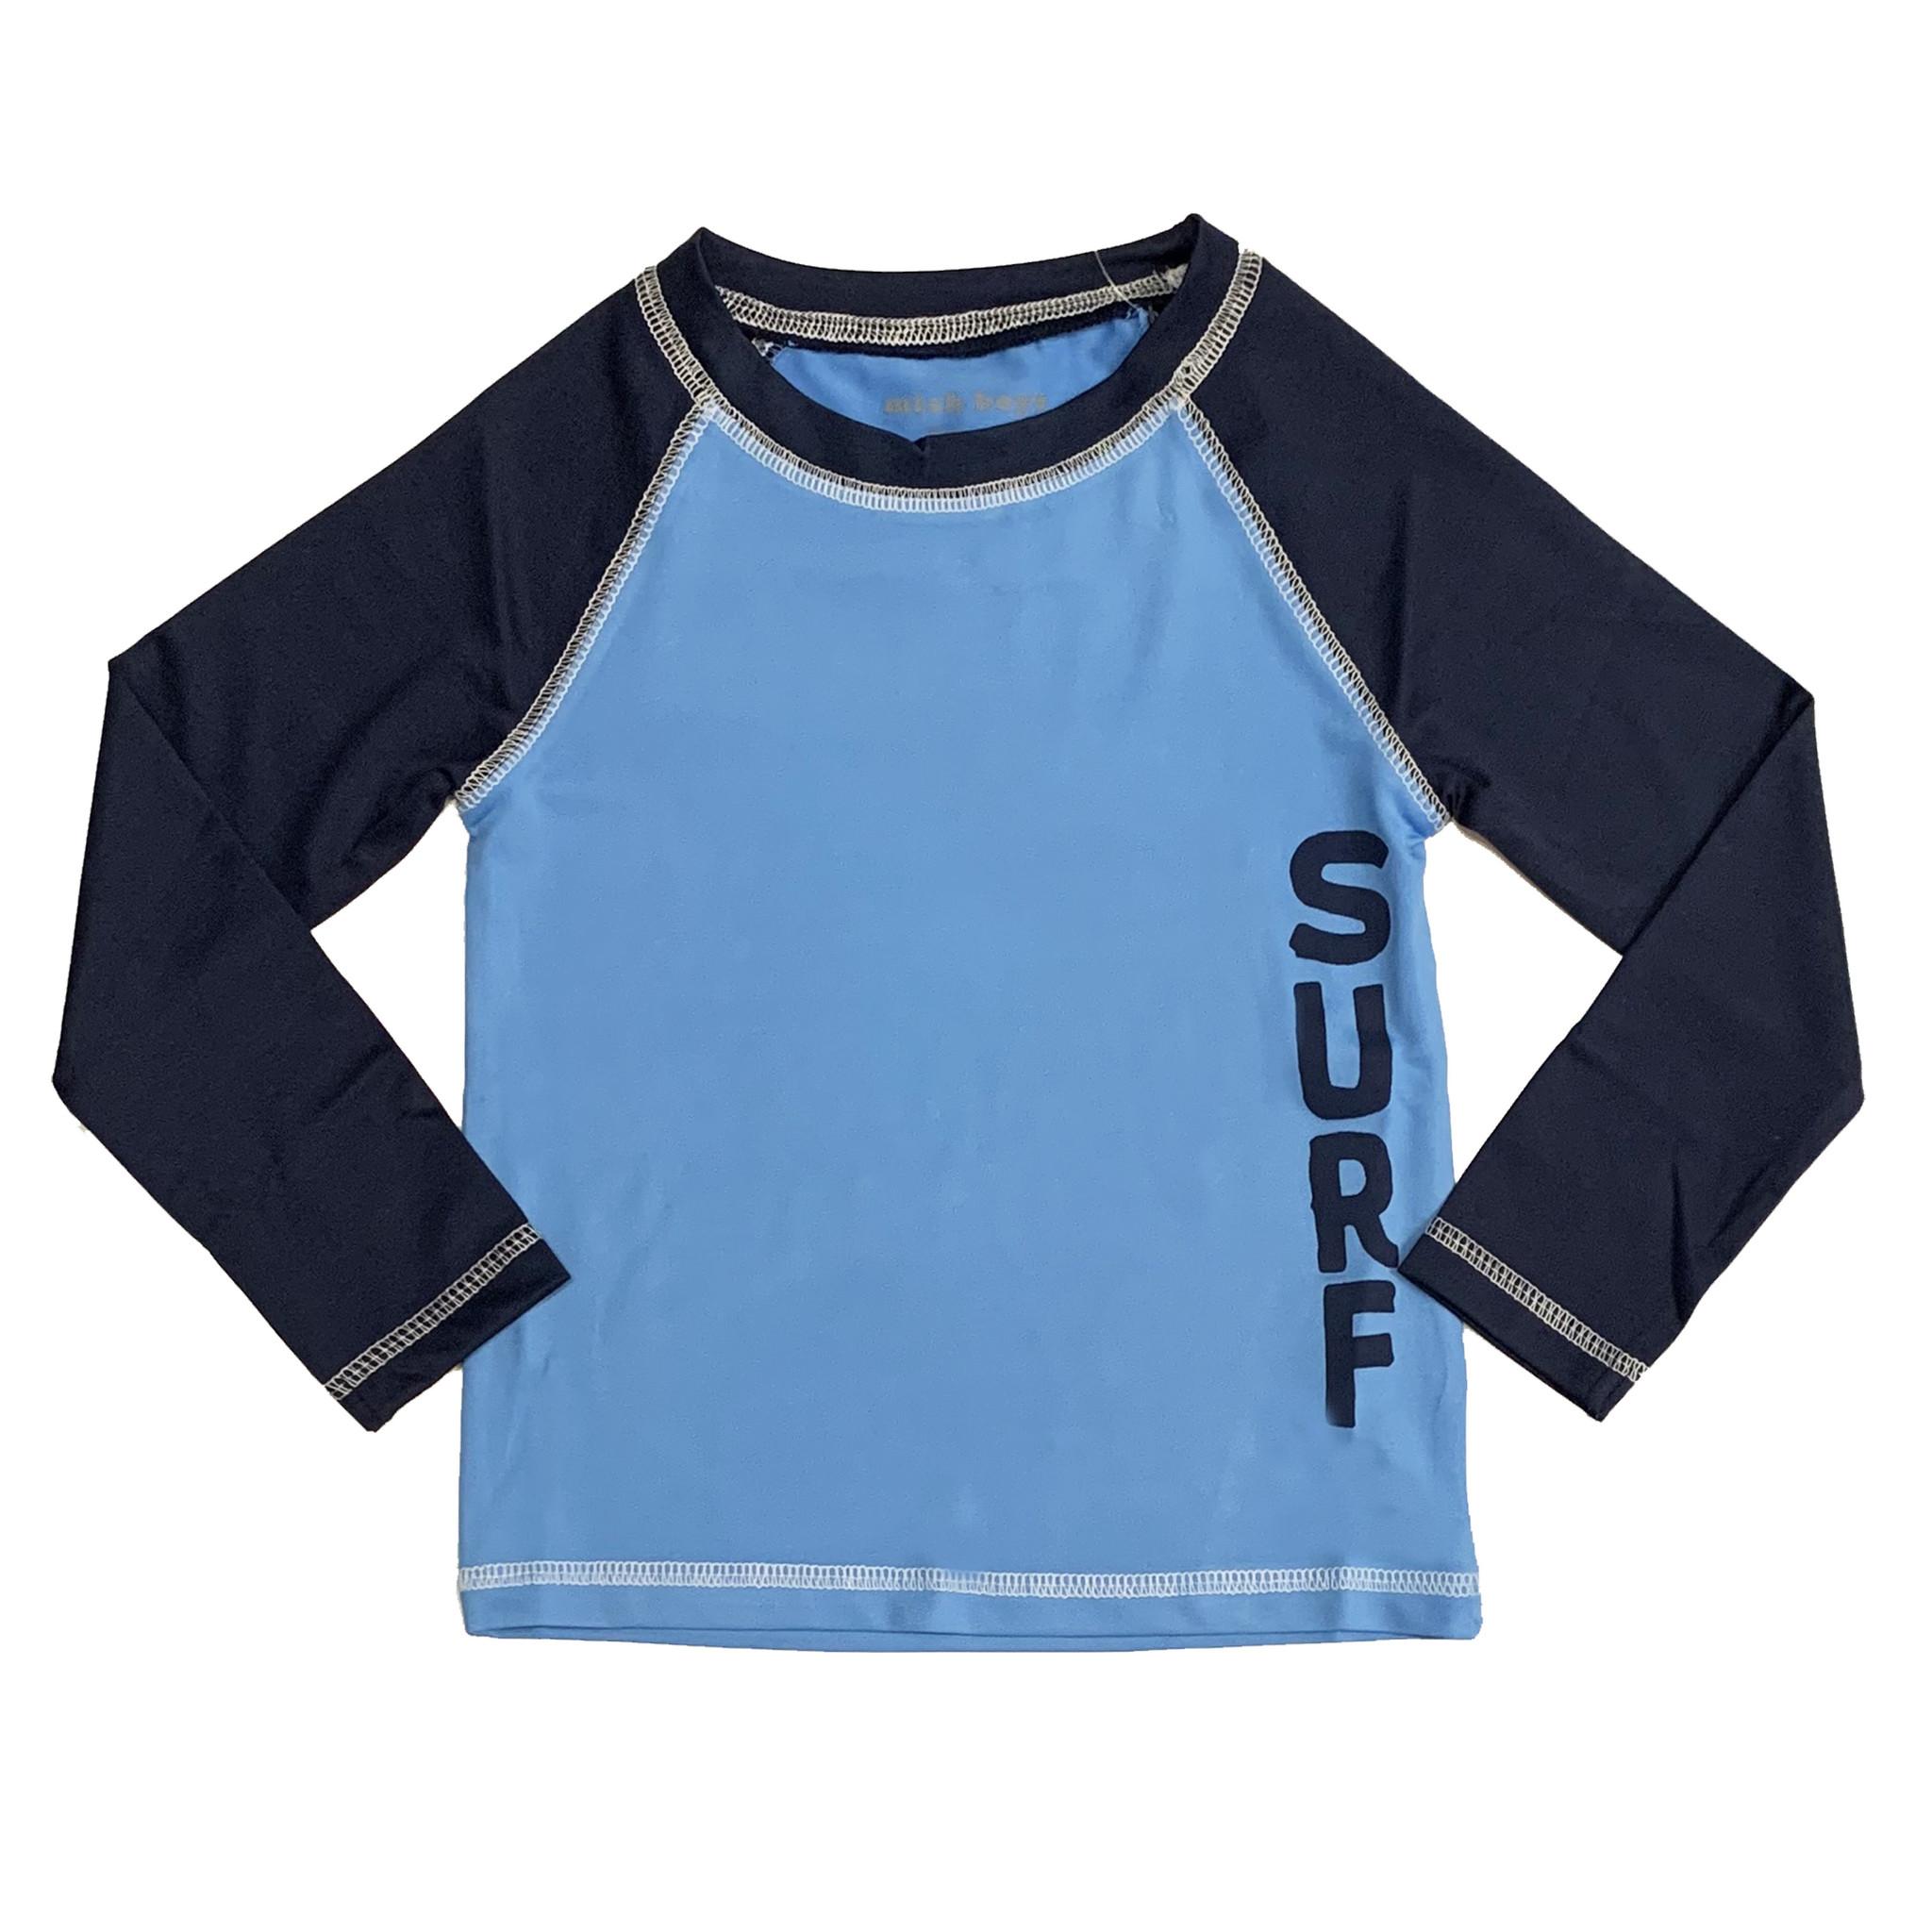 Mish Blue Surf Rashguard